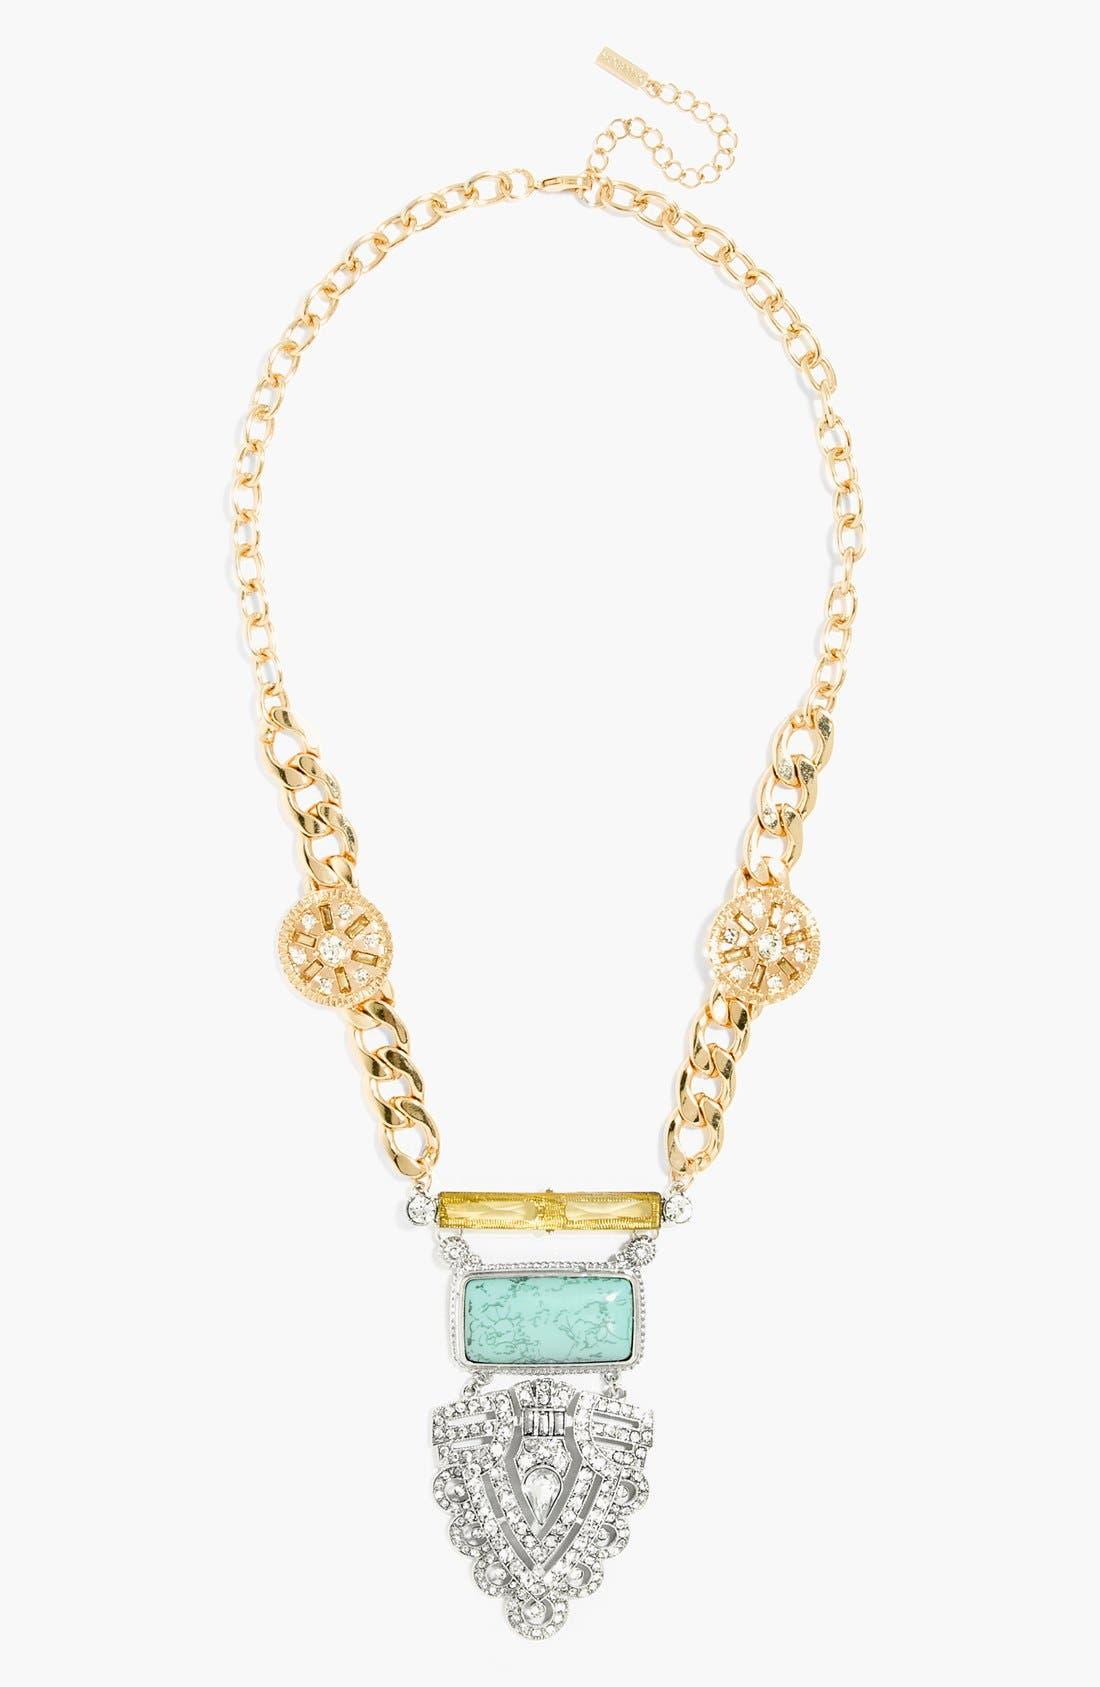 Main Image - BaubleBar 'Inca Priestess' Pendant Necklace